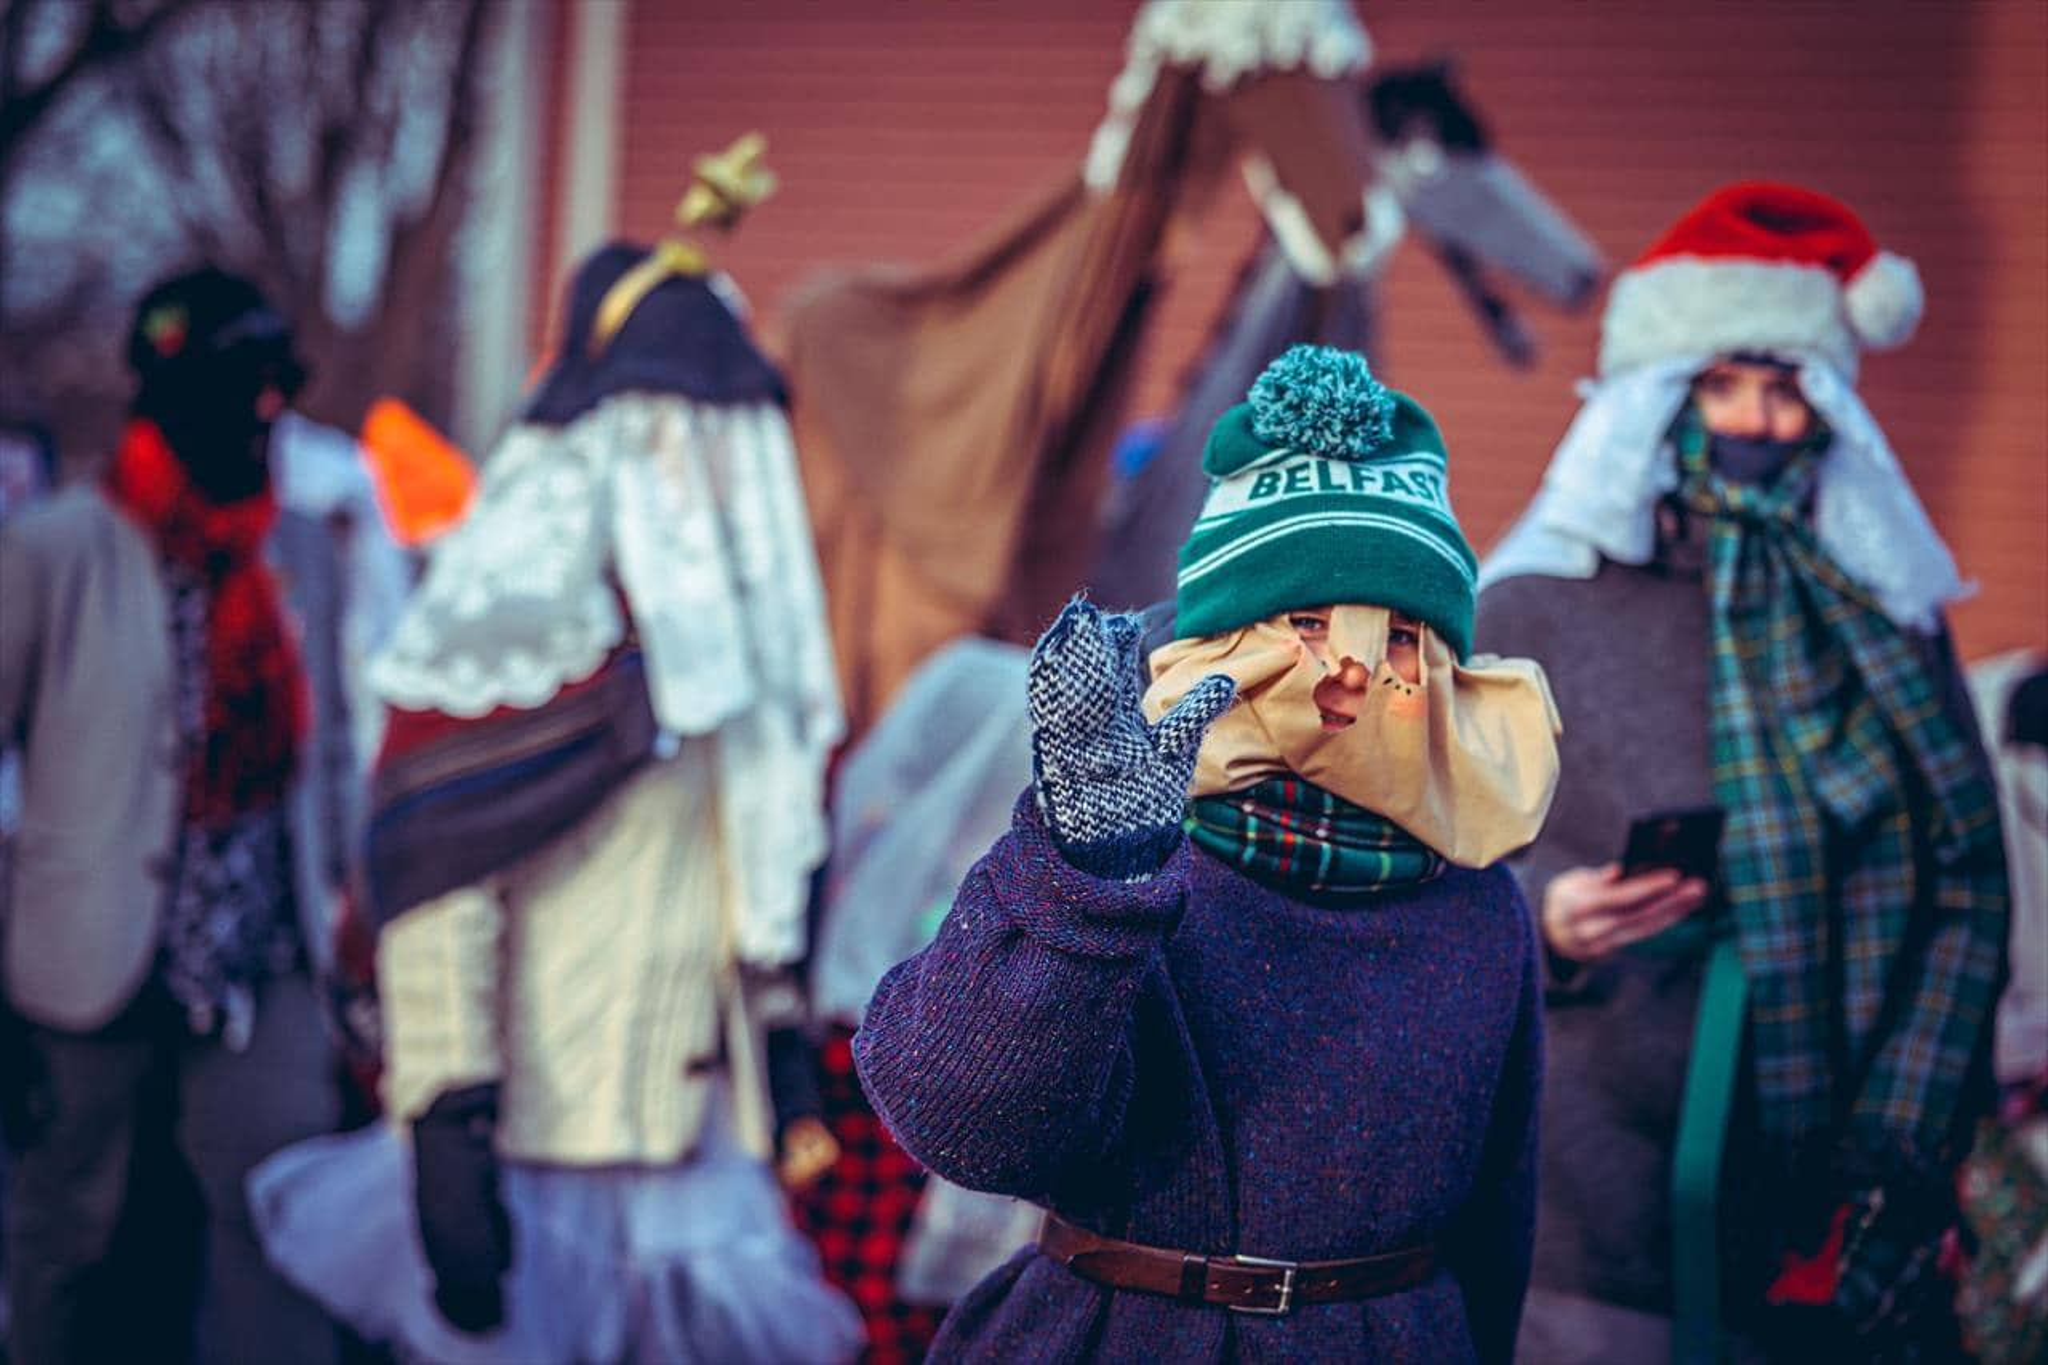 Mummer's Parade